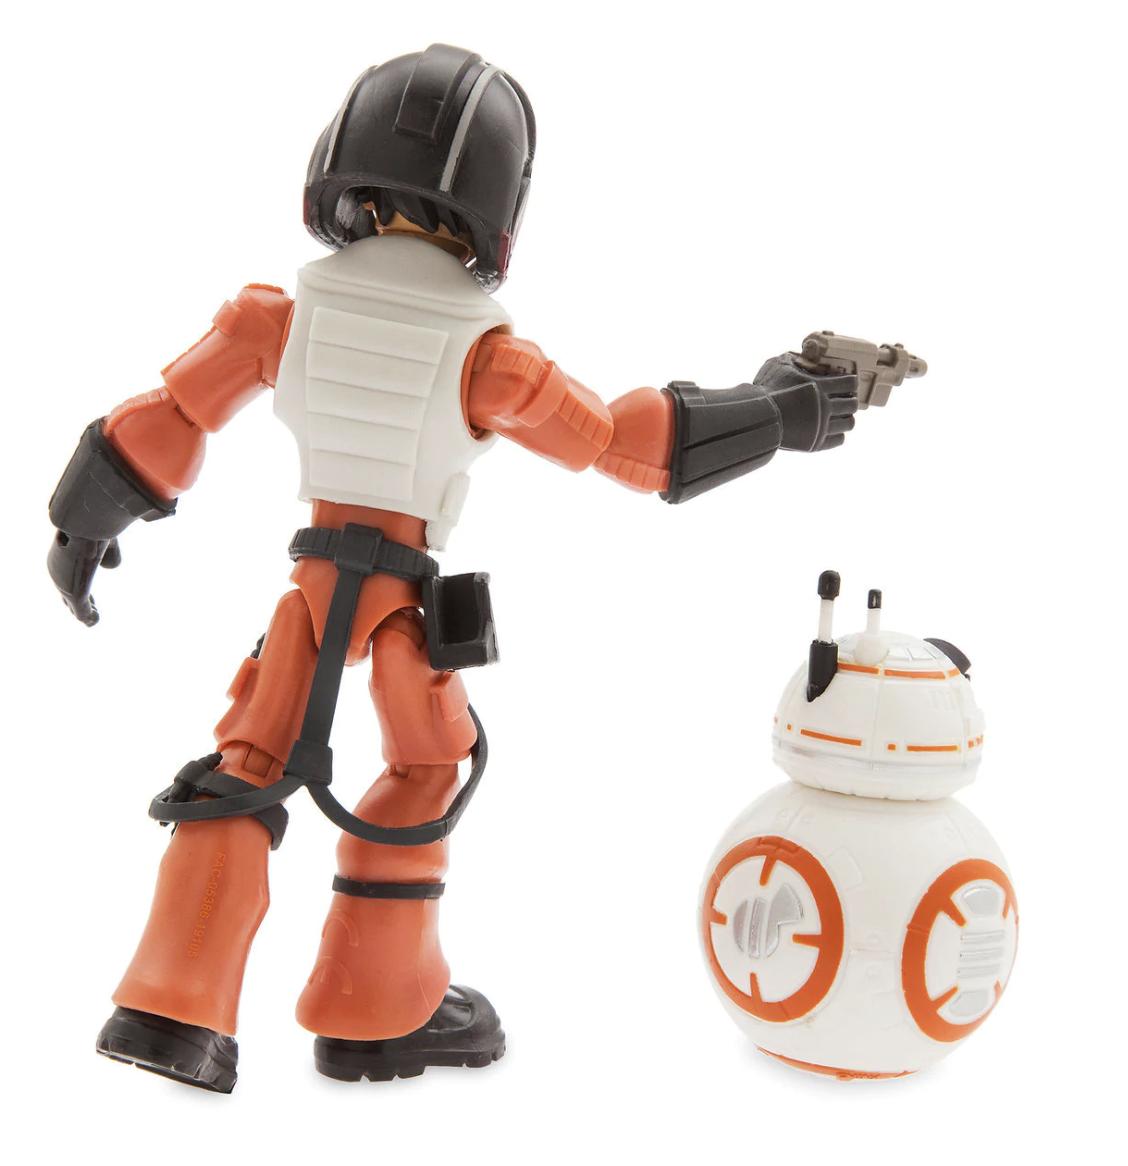 TROS Poe Dameron with BB-8 Toybox Figure Set 3